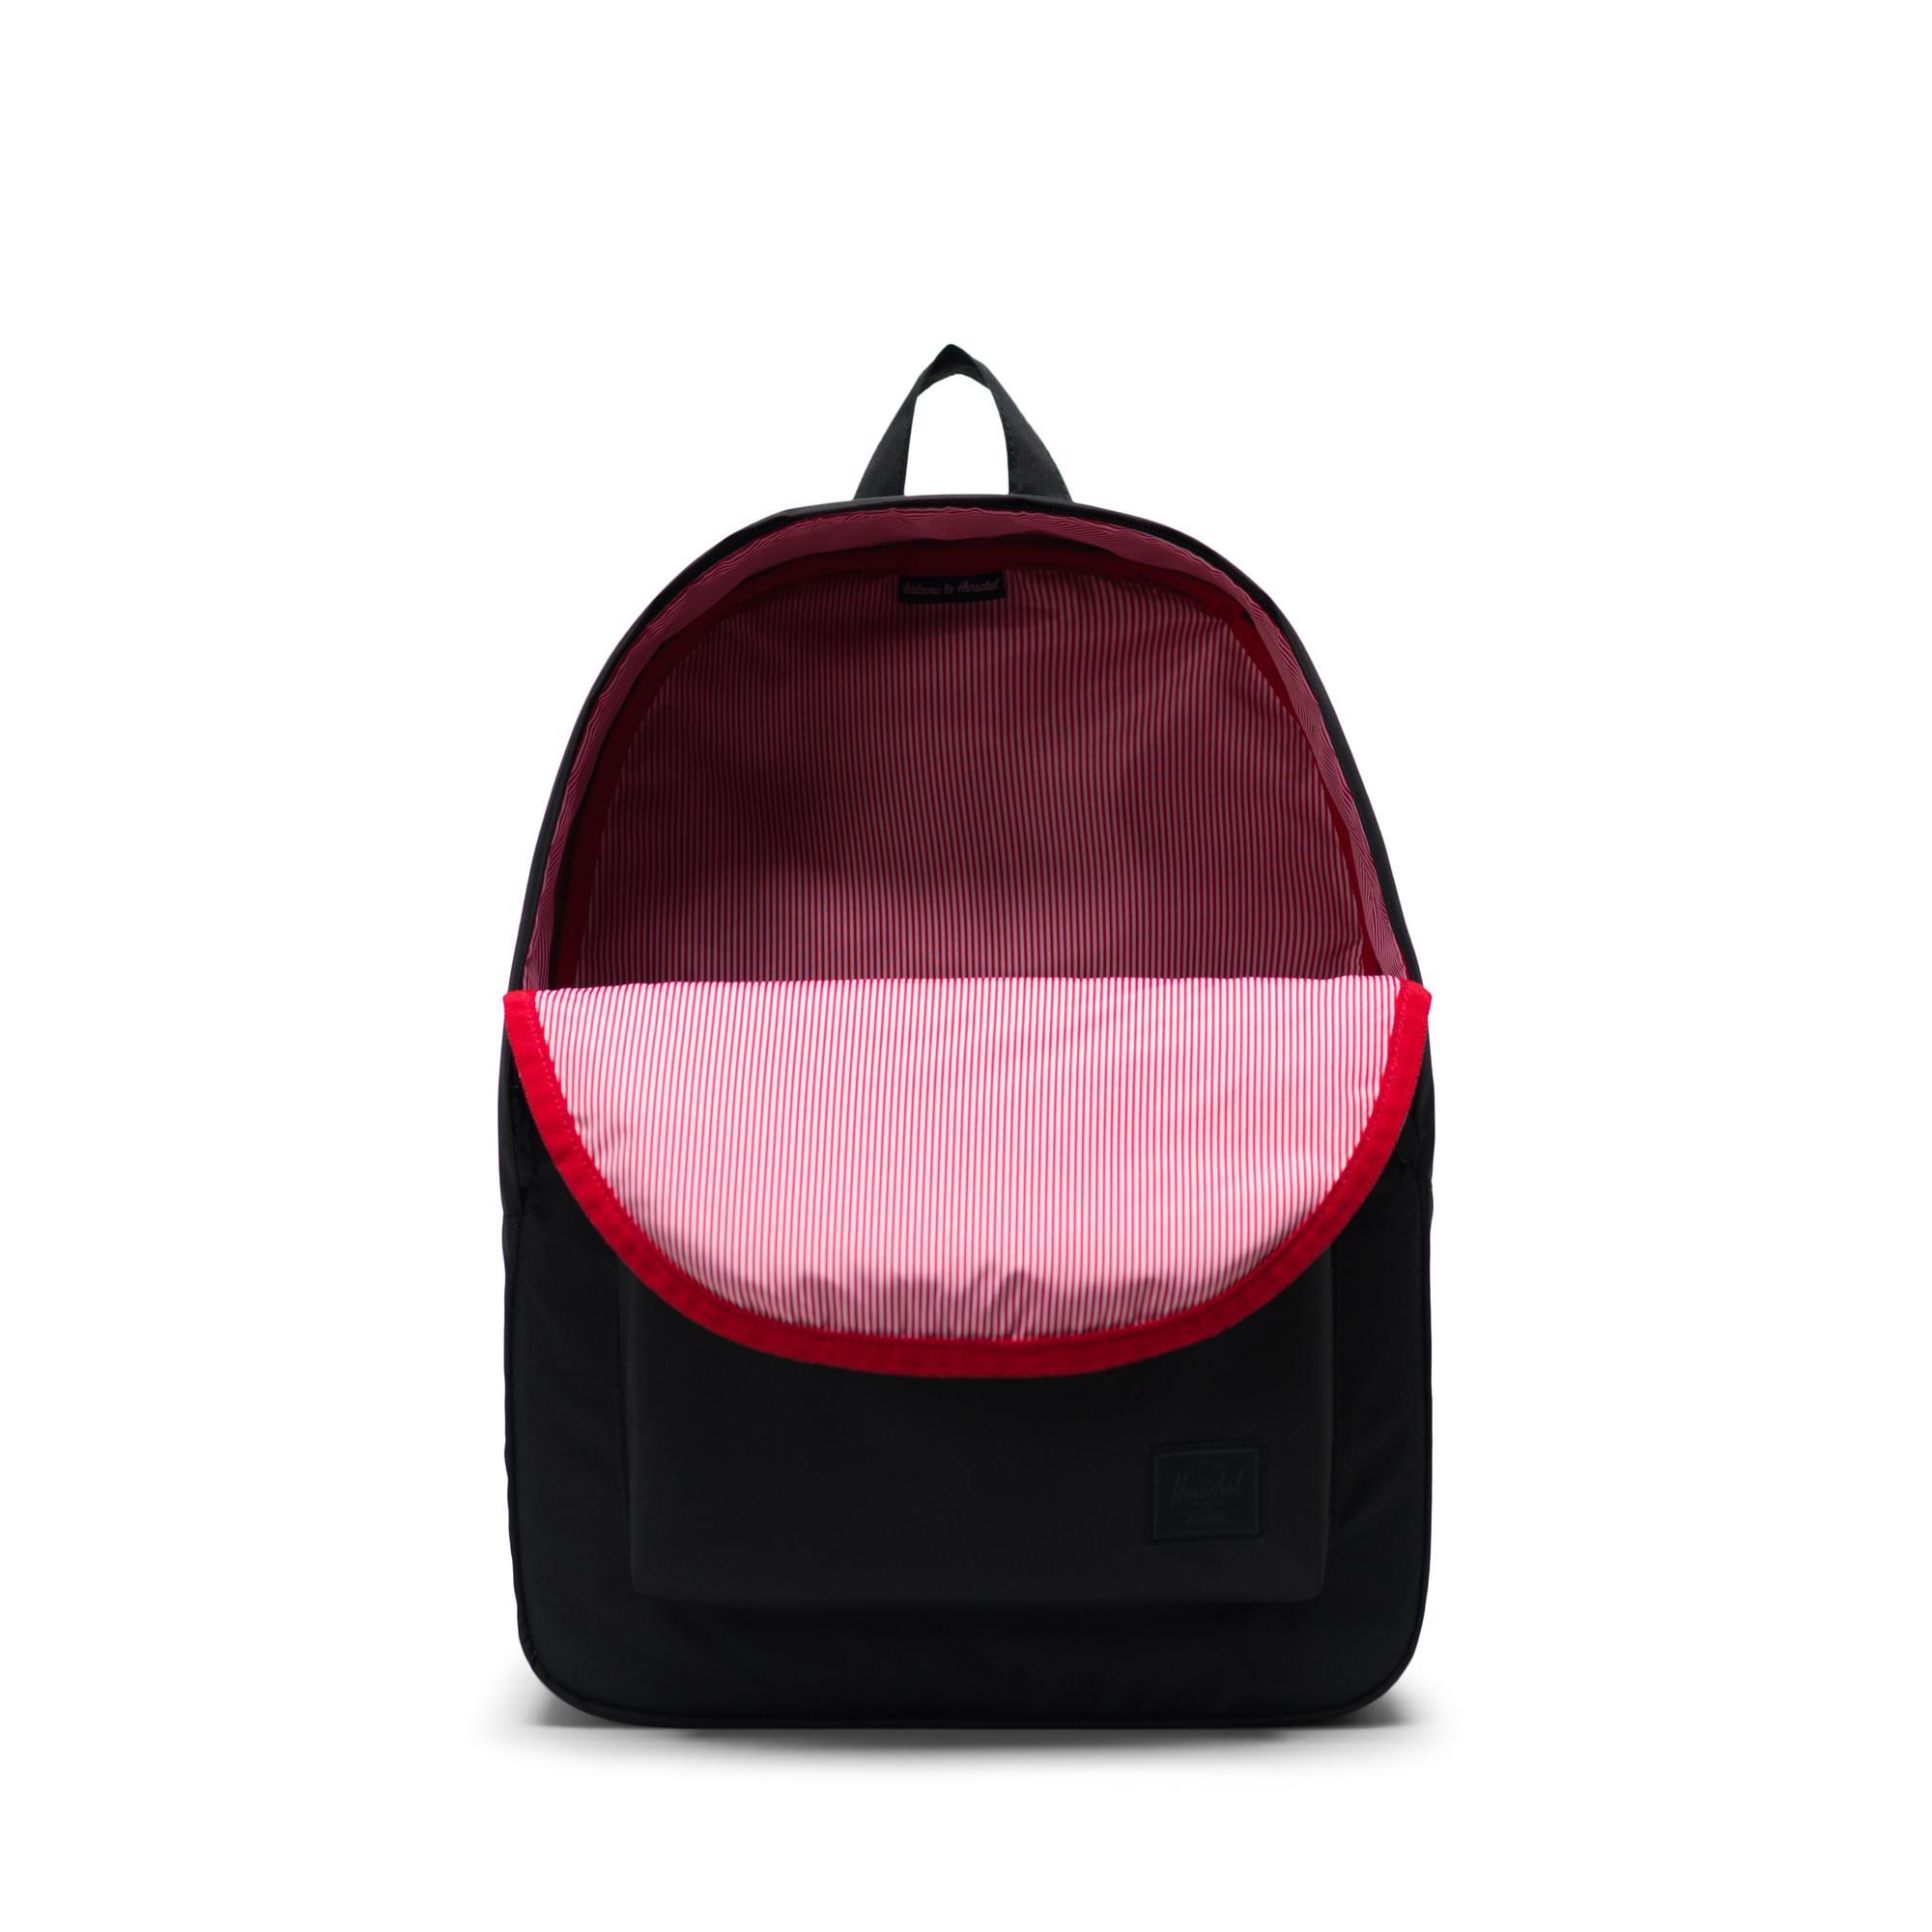 64d99cc7e2 Classic Backpack Light | Herschel Supply Company